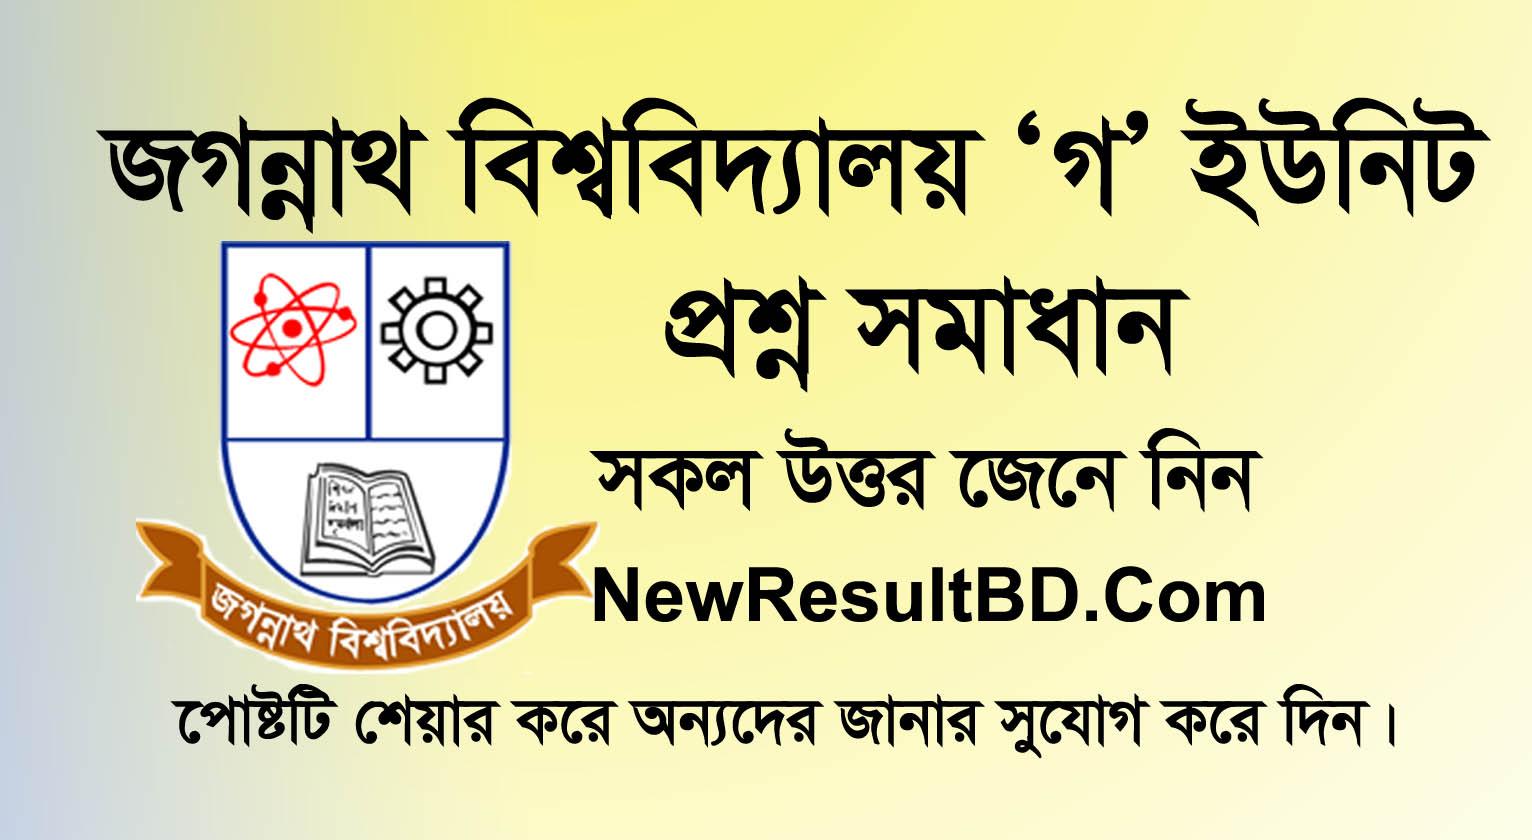 Jagannath University GA unit question solve 2019, JNU C unit solutions 2019, JNU C unit solve, জগন্নাথ বিশ্ববিদ্যালয় গ ইউনিট, C unit Solution 2019 of JNU.